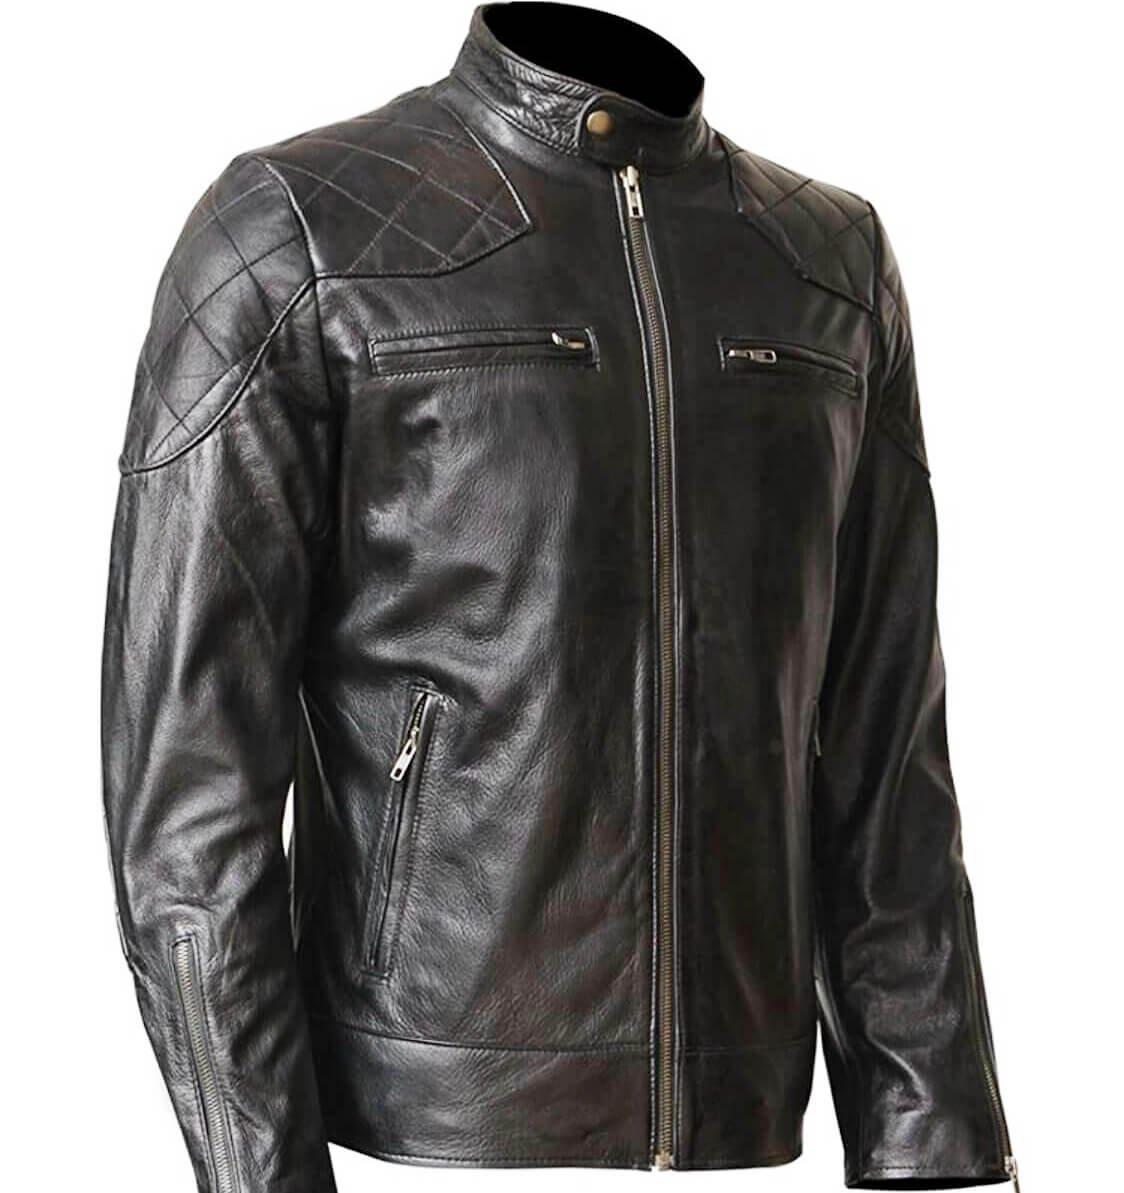 Black,WONDERPIEL Men's Genuine Leather Jacket Stand Collar - Black Motorcycle Slim Fit,X-Large,Black